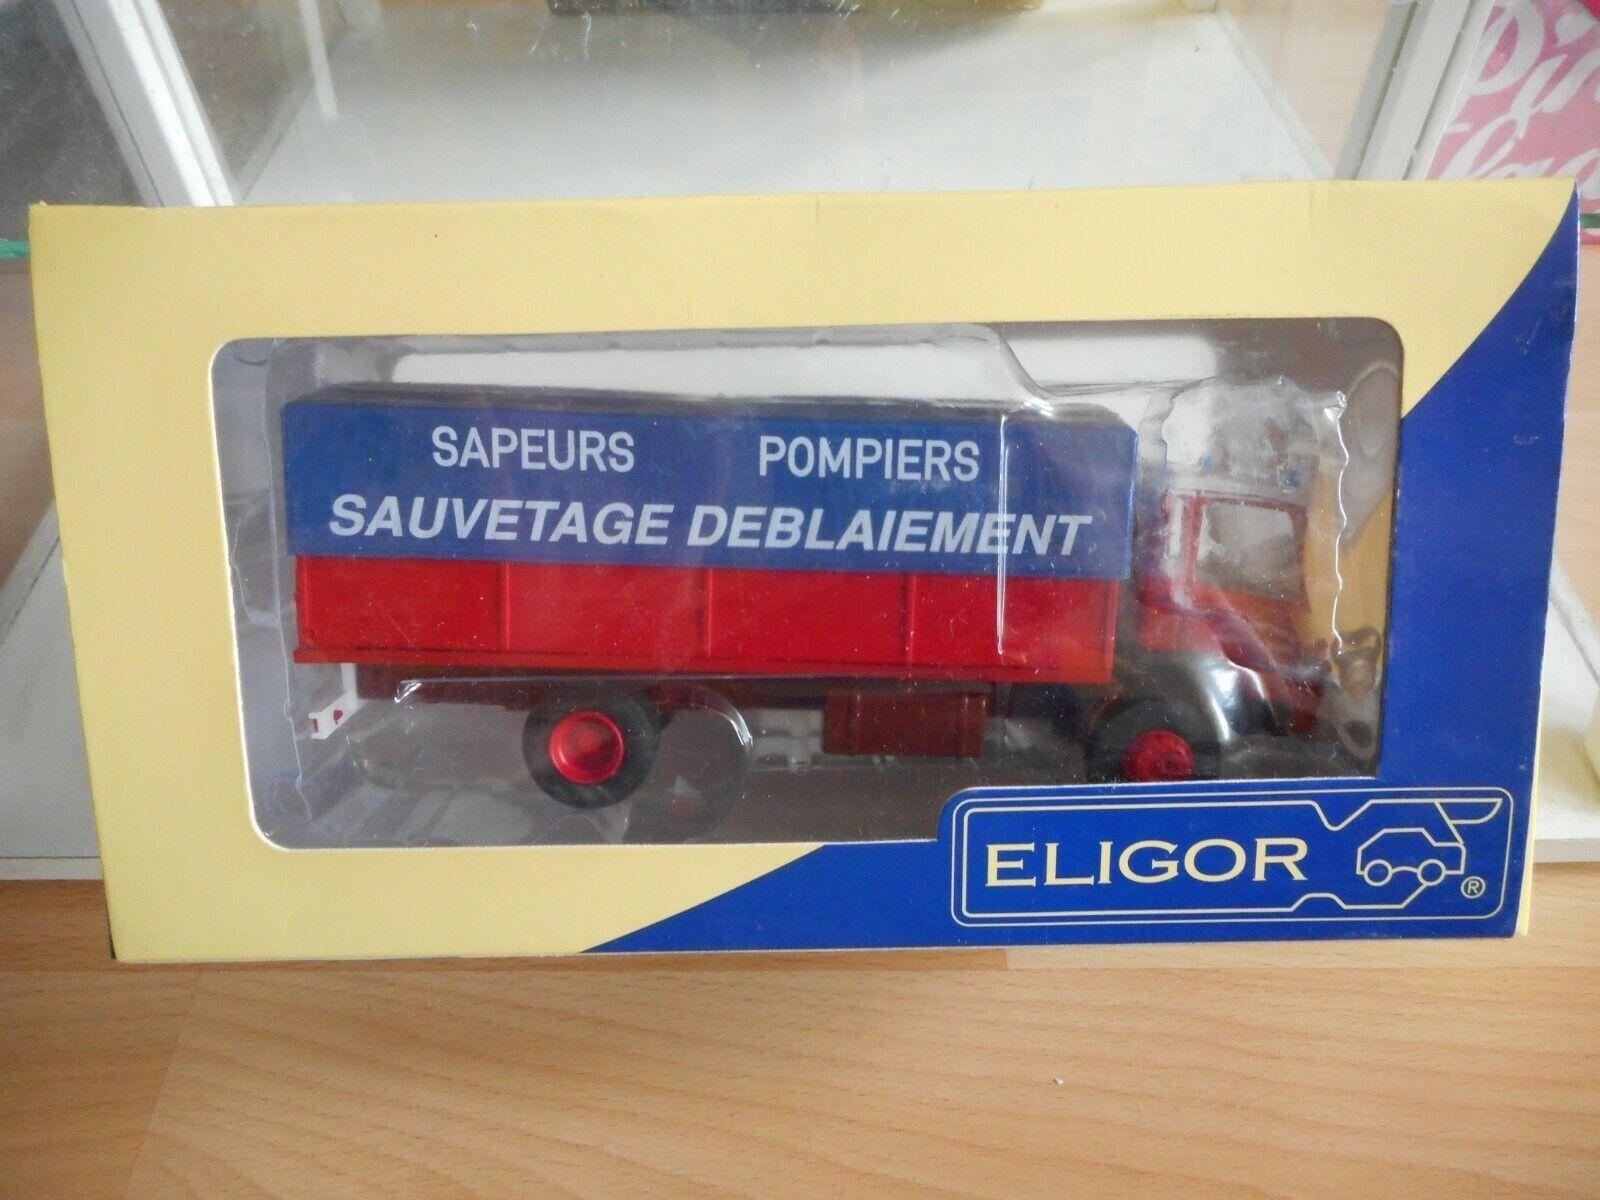 Eligor Berliet GR190 Sapers Pompiers in rouge bleu on 1 43 in Box